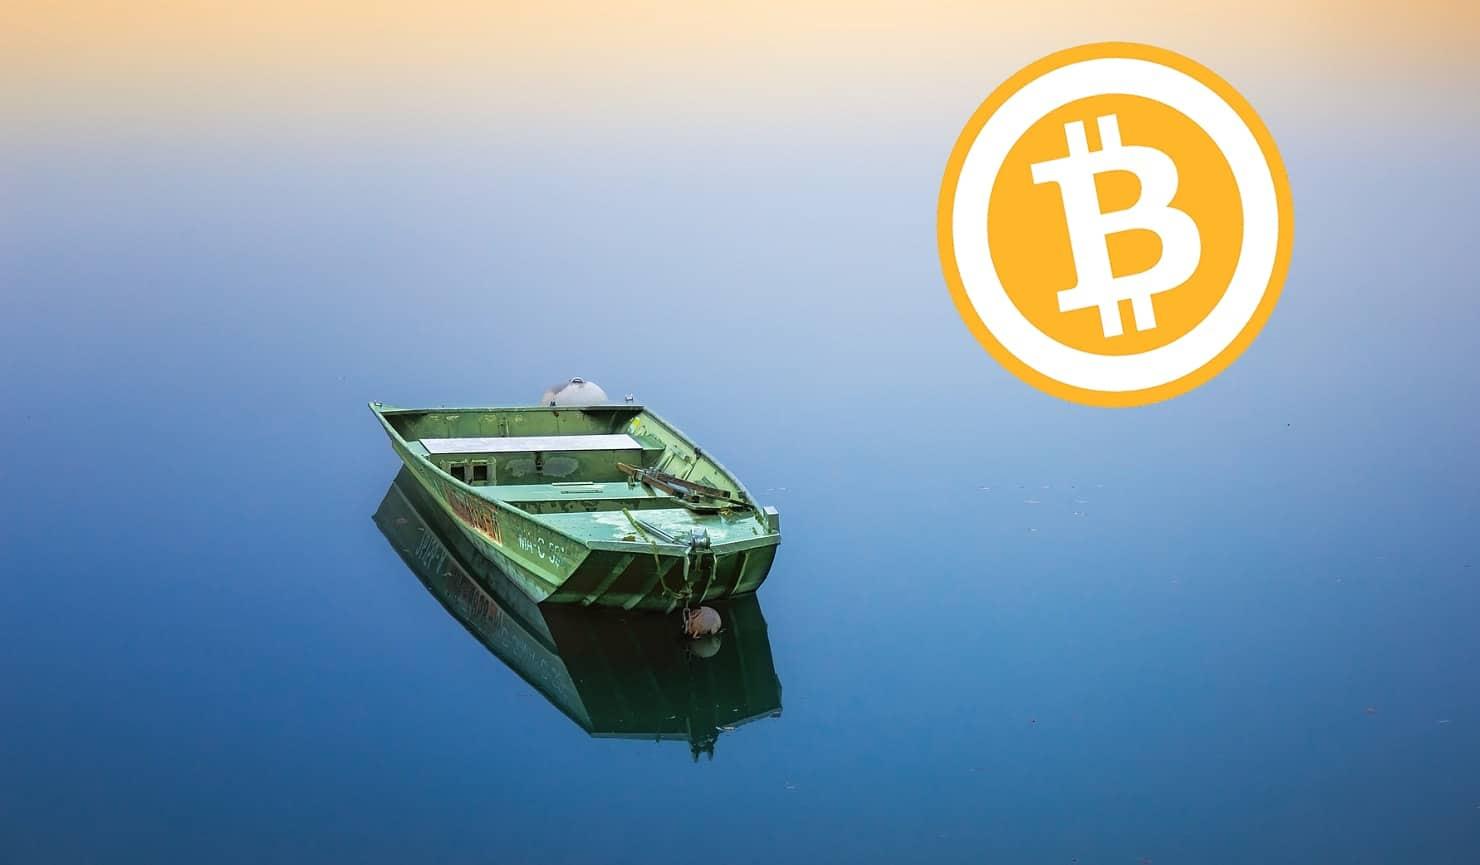 Bitcoin Price Forecast: BTC/USD Could Break $5K